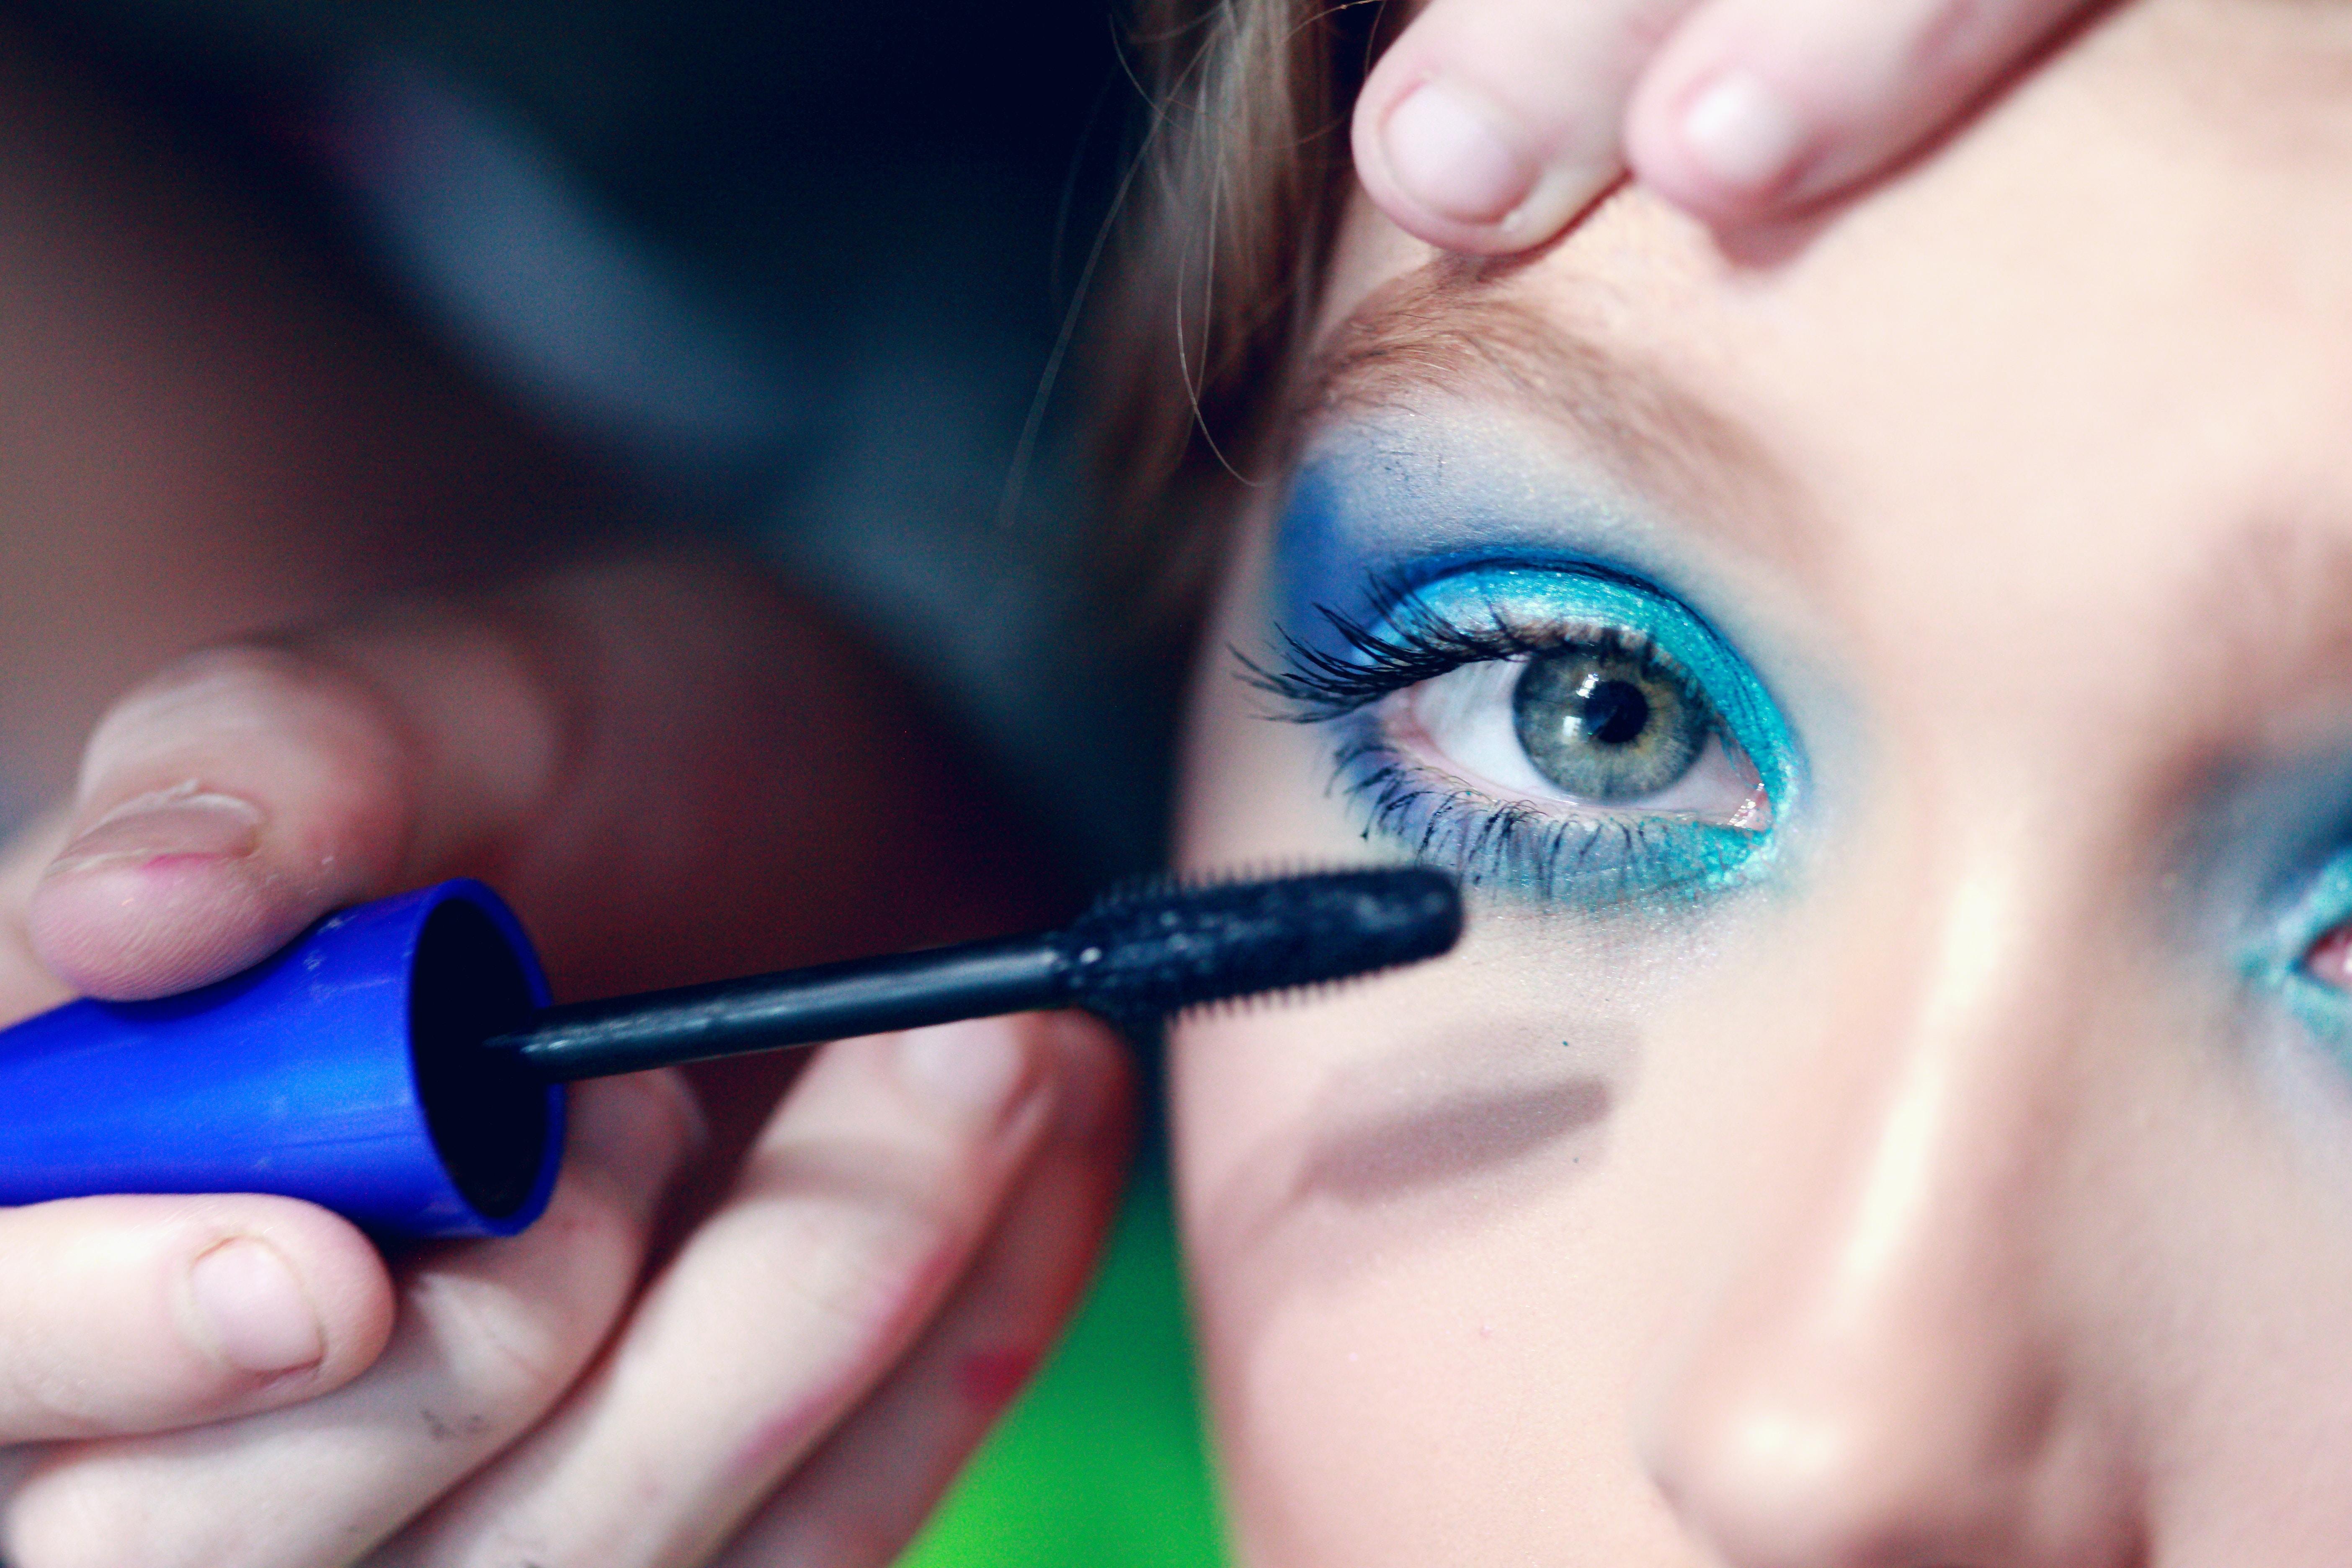 mascara being applied on woman's eyelash with blue eyeshadow